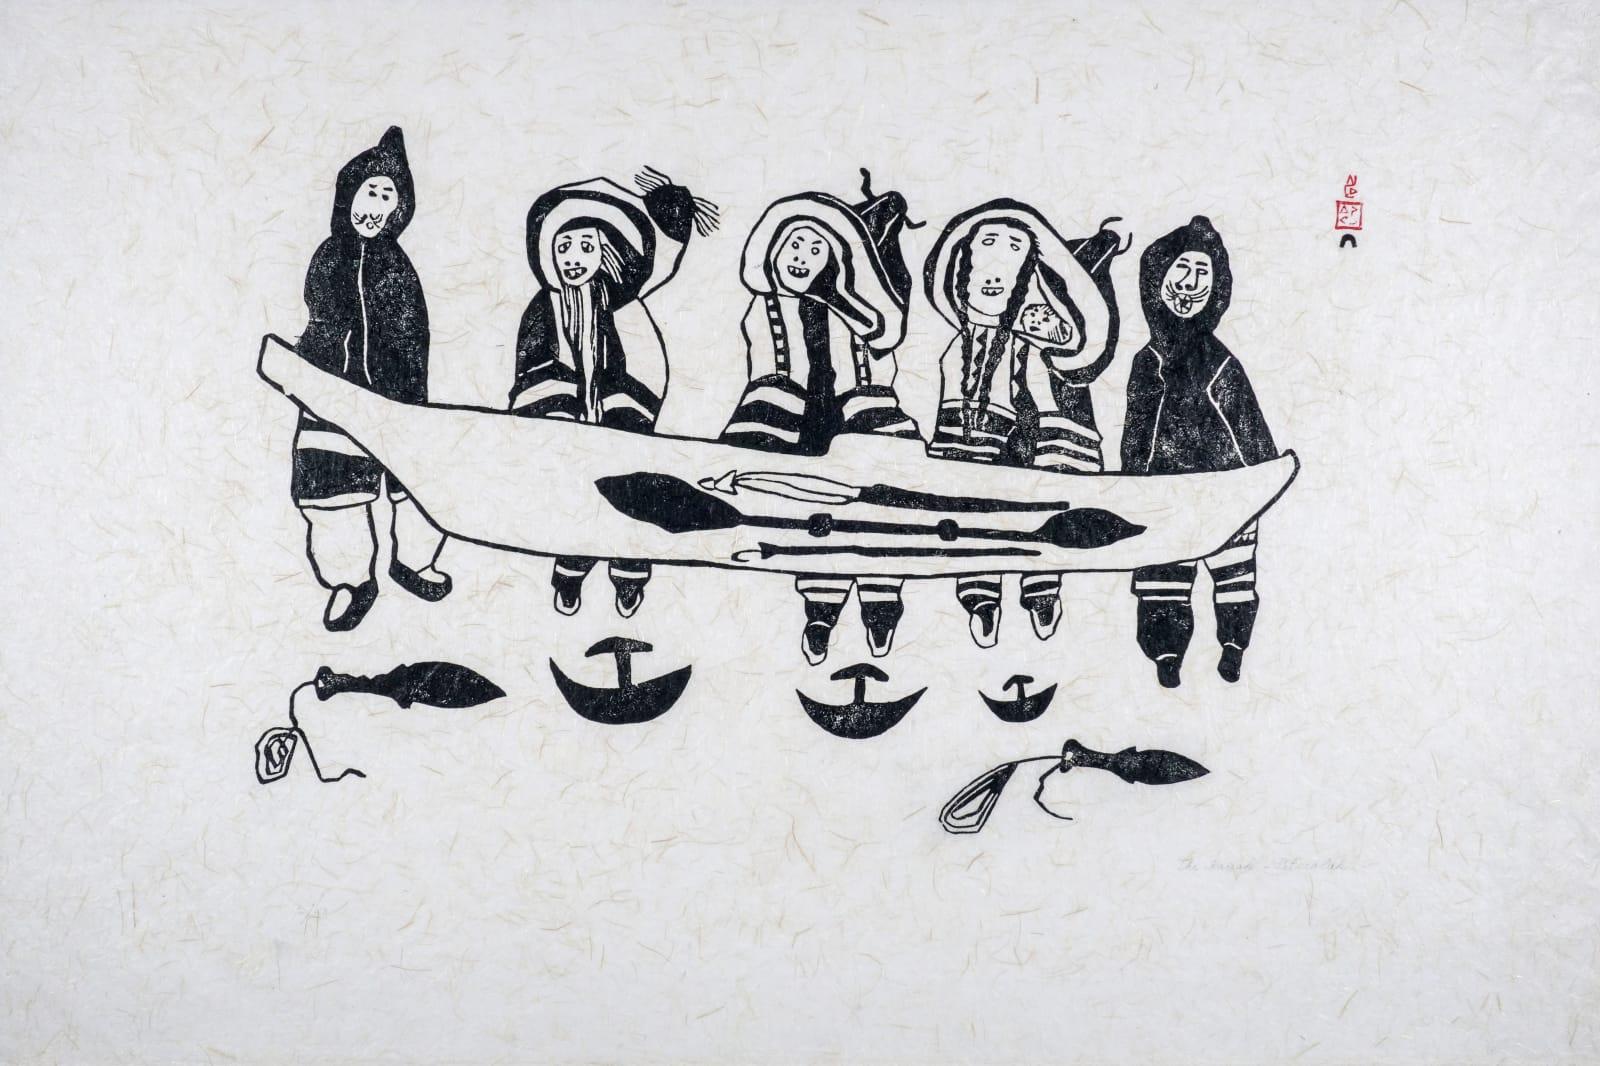 LOT 20 PITSEOLAK ASHOONA, R.C.A., O.C., (1904-1983) KINNGAIT (CAPE DORSET) The Kayak (Kayak and Family), 1962 stonecut, 24 x 28 in (61 x 71.1 cm) ESTIMATE: $800 — $1,200